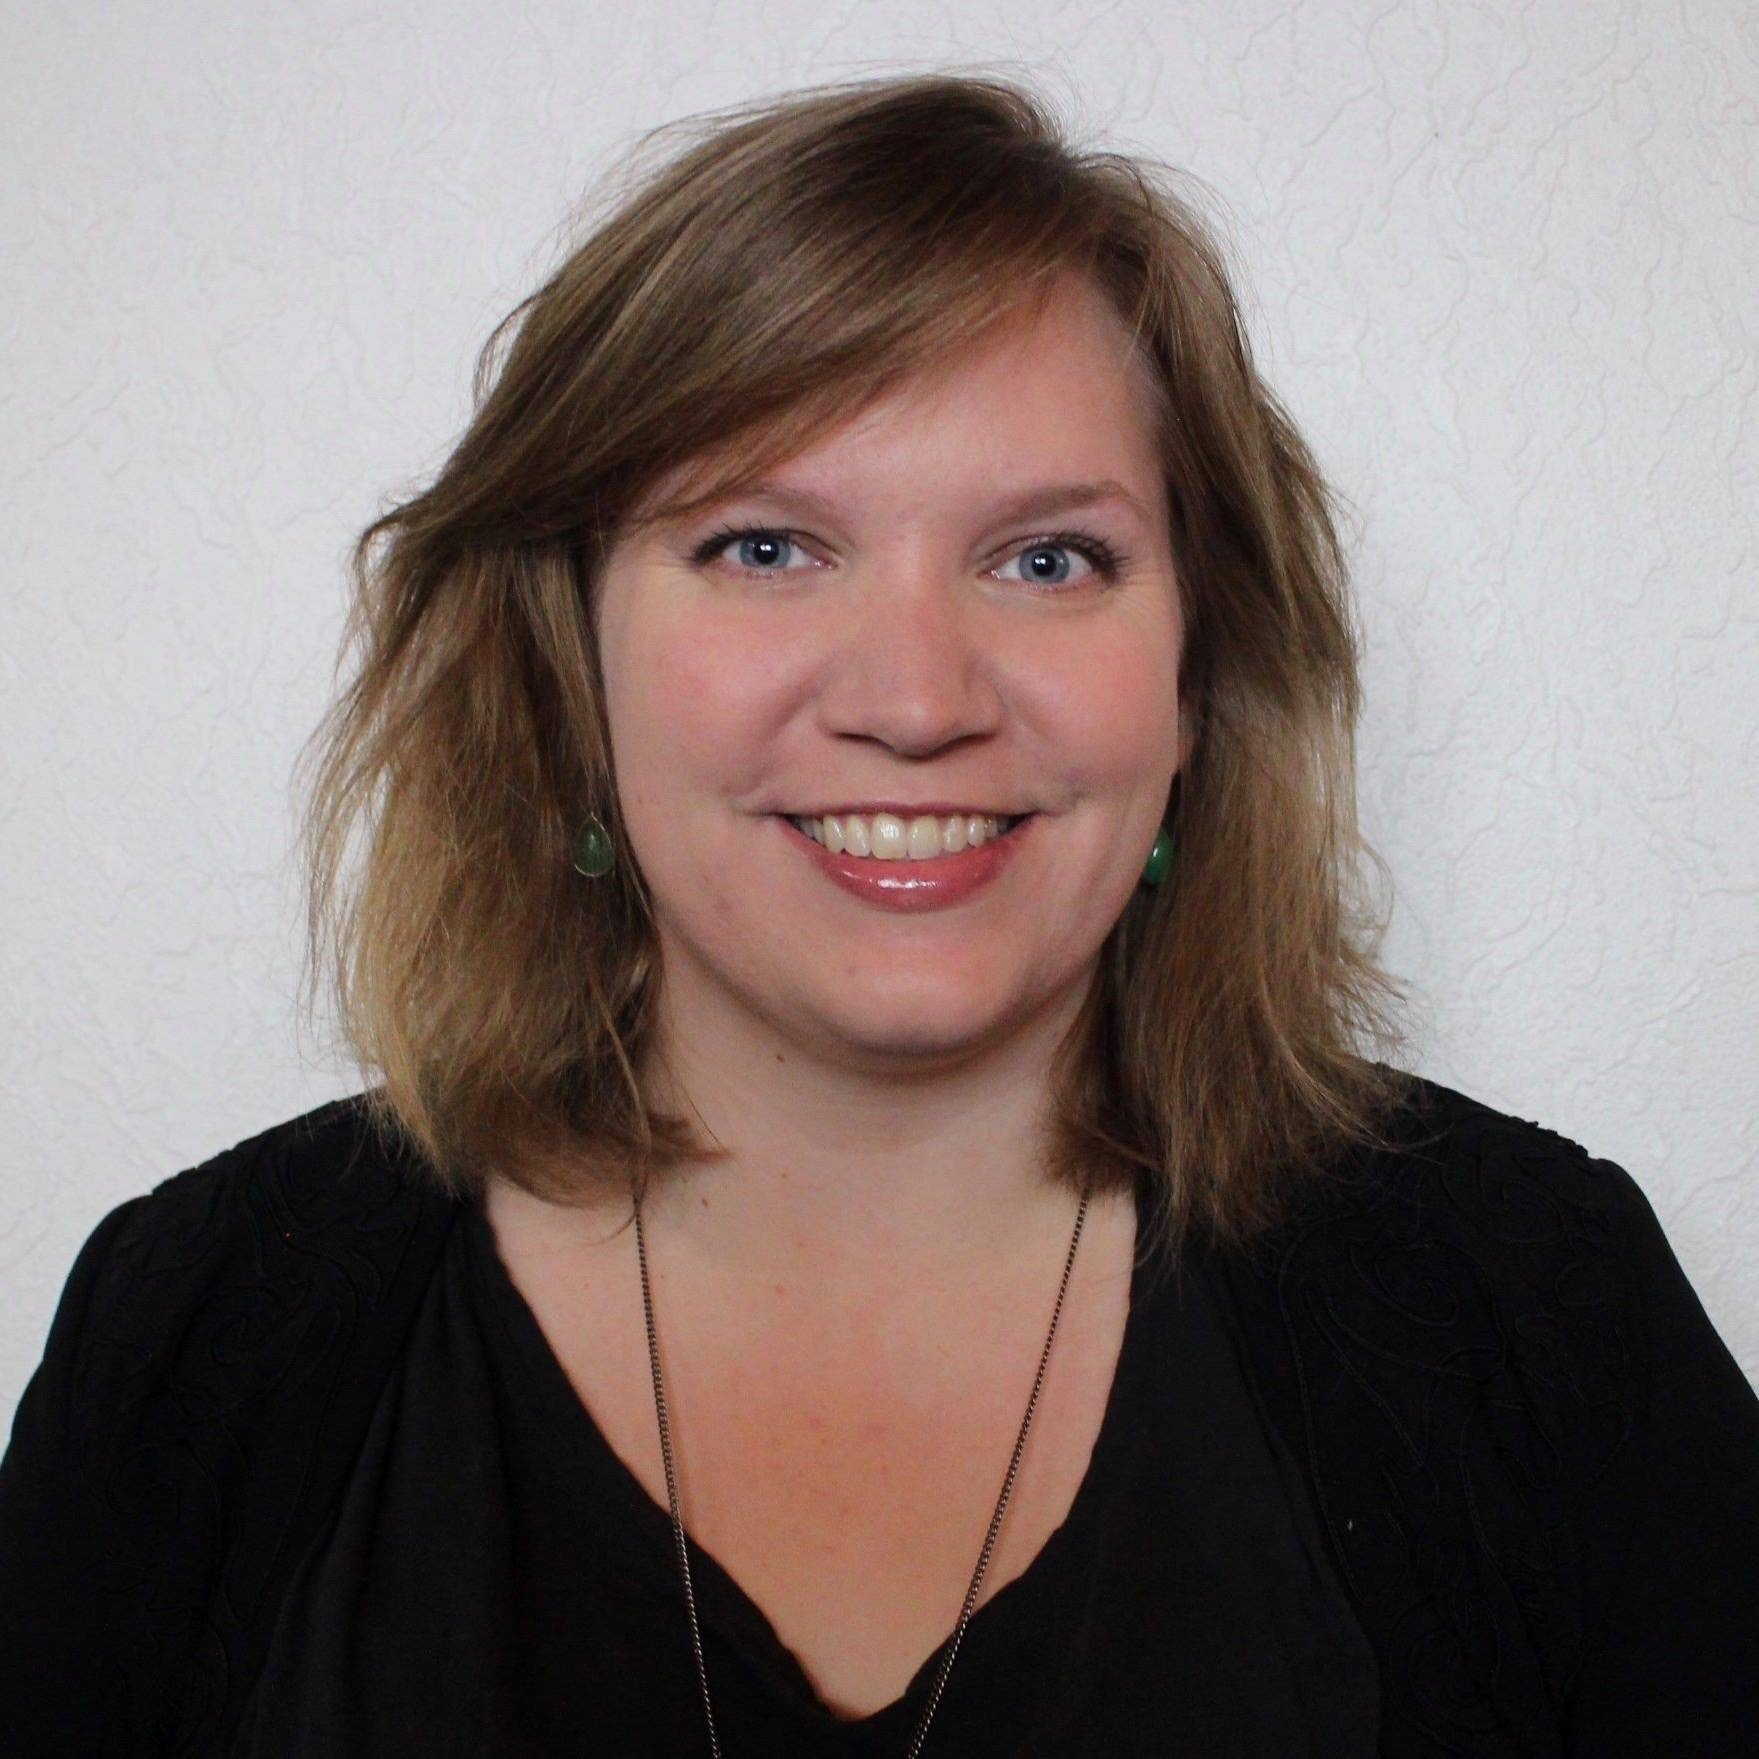 Sara Lassen